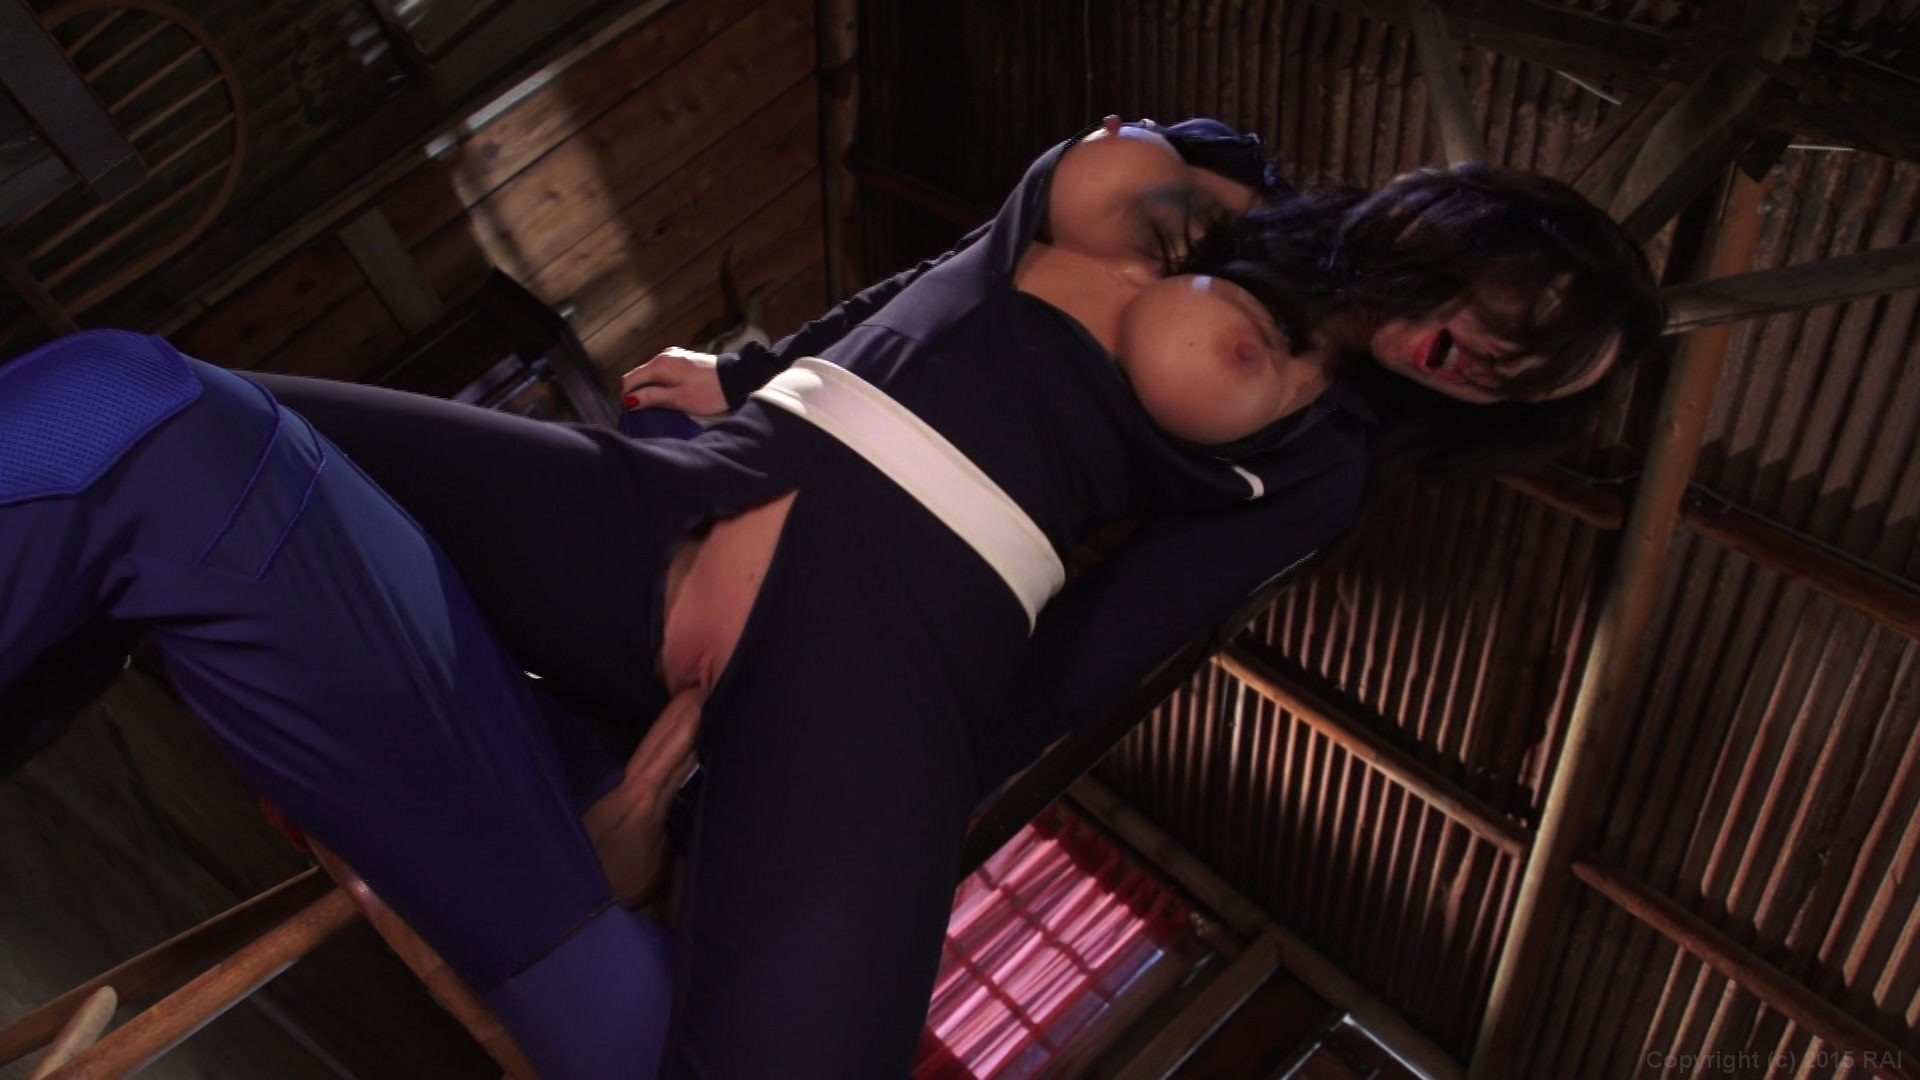 Continue reading The Avengers XXX 2 – A Porn Parody [2015/WEBRip